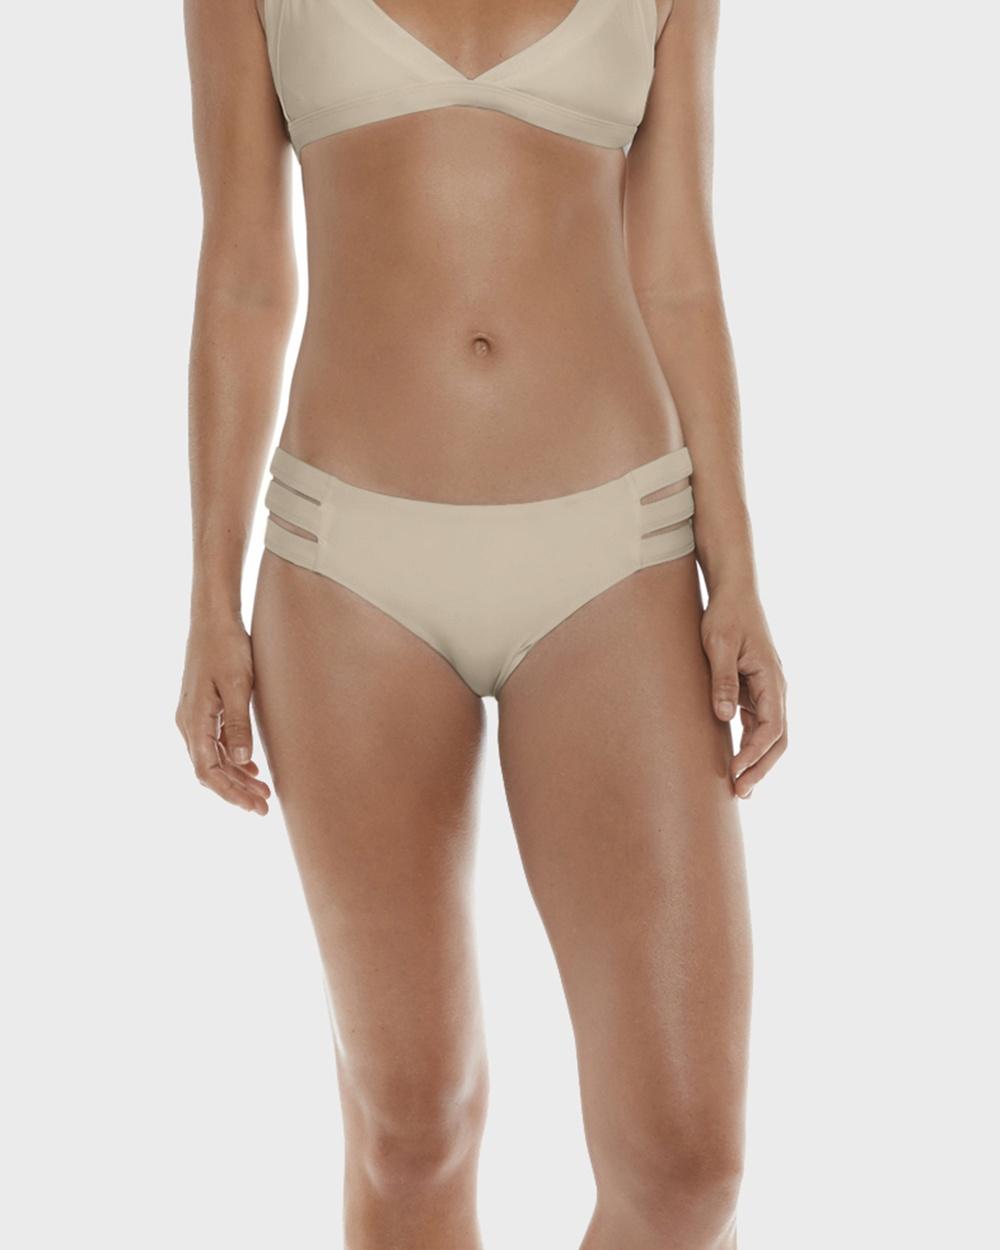 Allerton Banded Boyleg Briefs Bikini Bottoms Nude Banded Boyleg Briefs